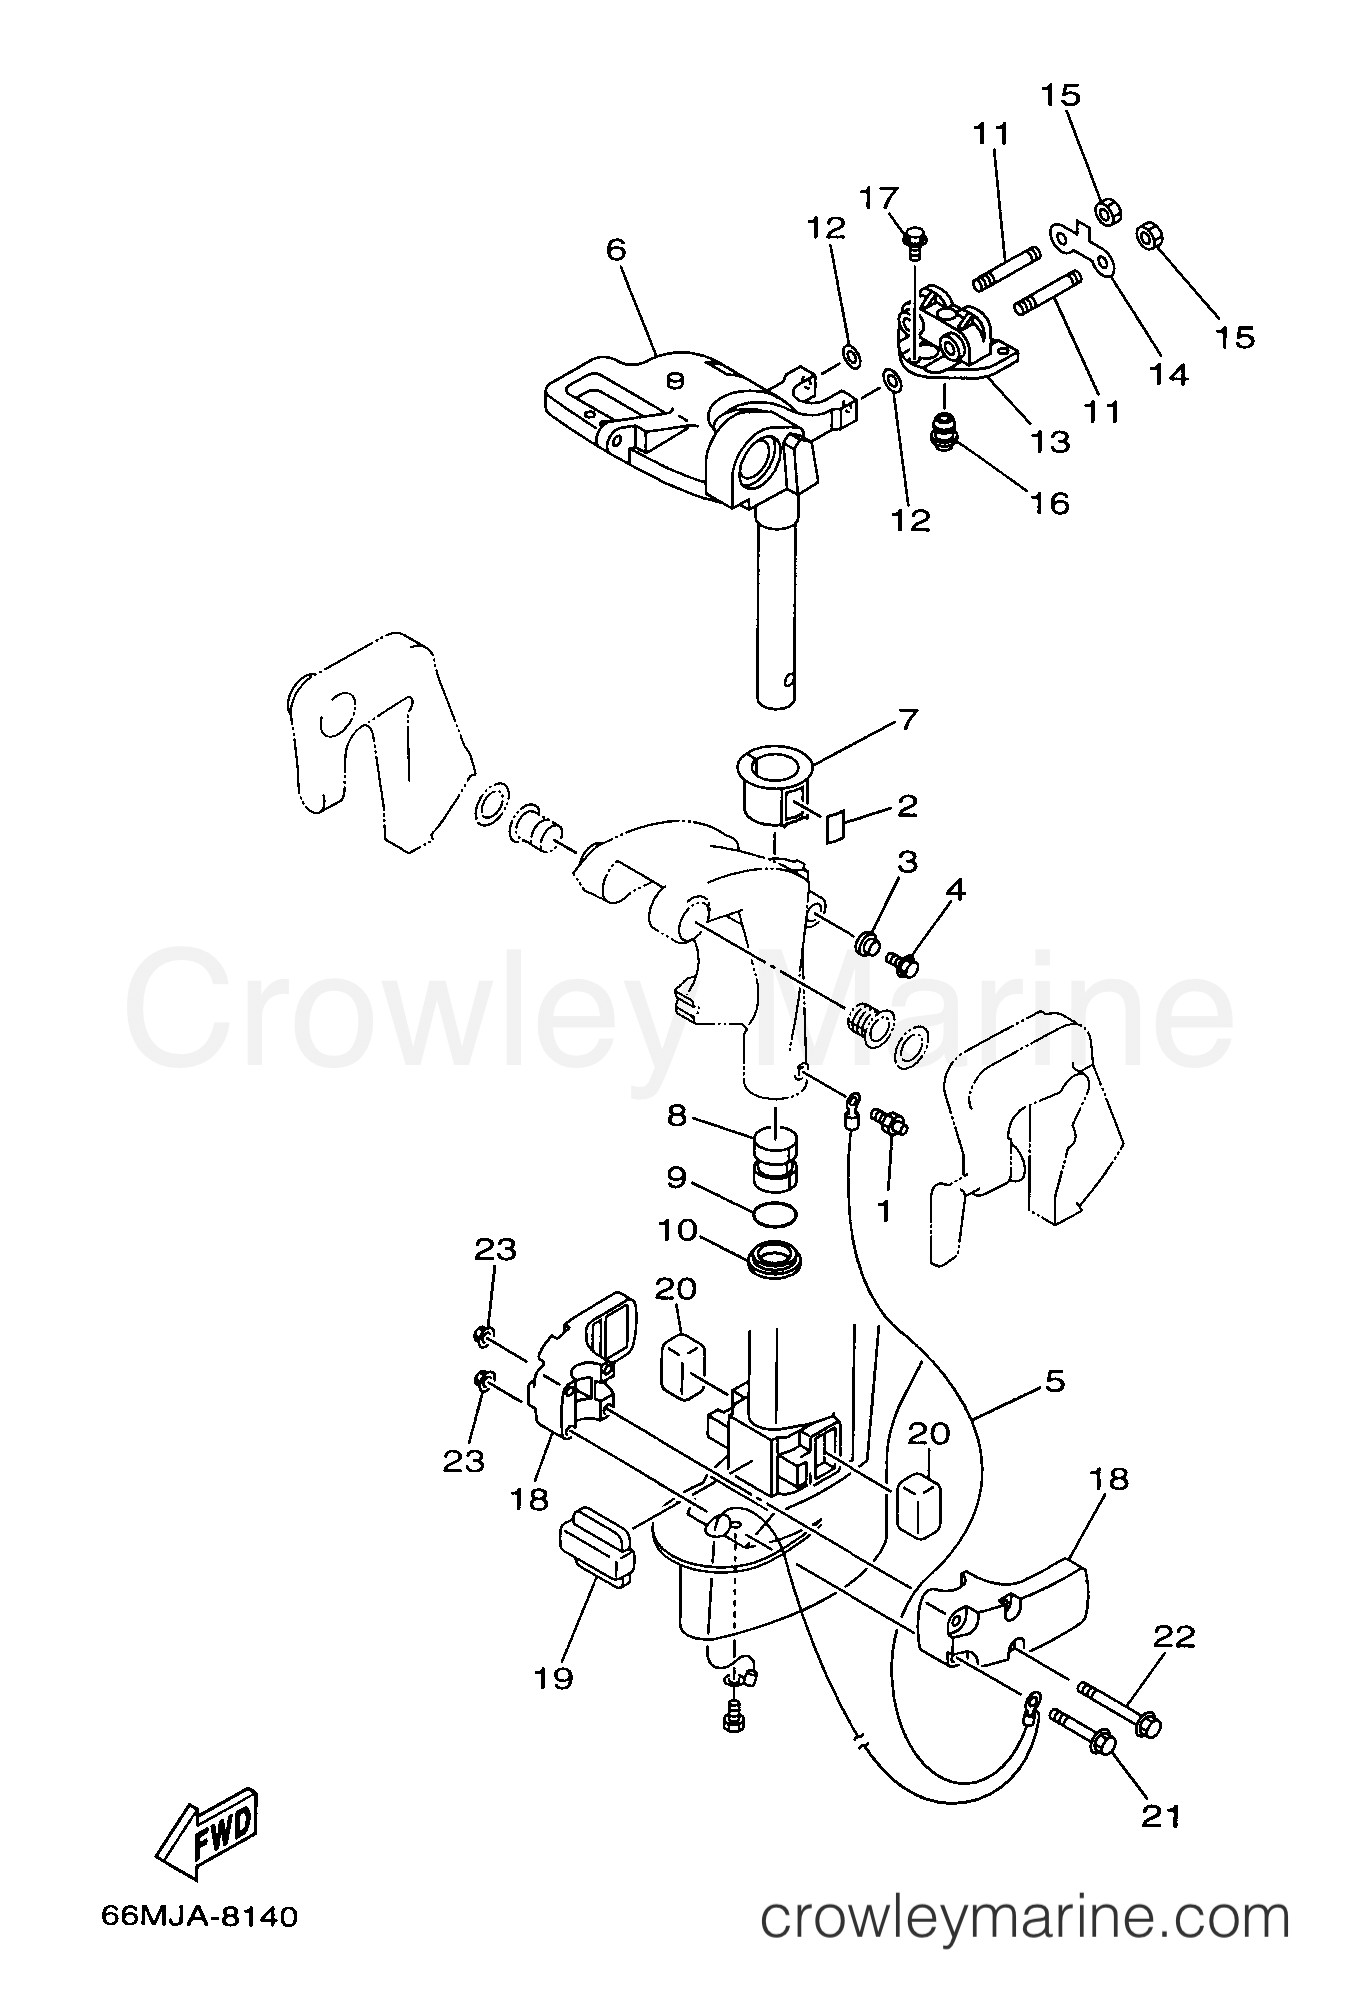 15 Hp Evinrude Parts Diagram Bracket 2 1999 Yamaha Outboard 15hp F15eshx Of 15 Hp Evinrude Parts Diagram